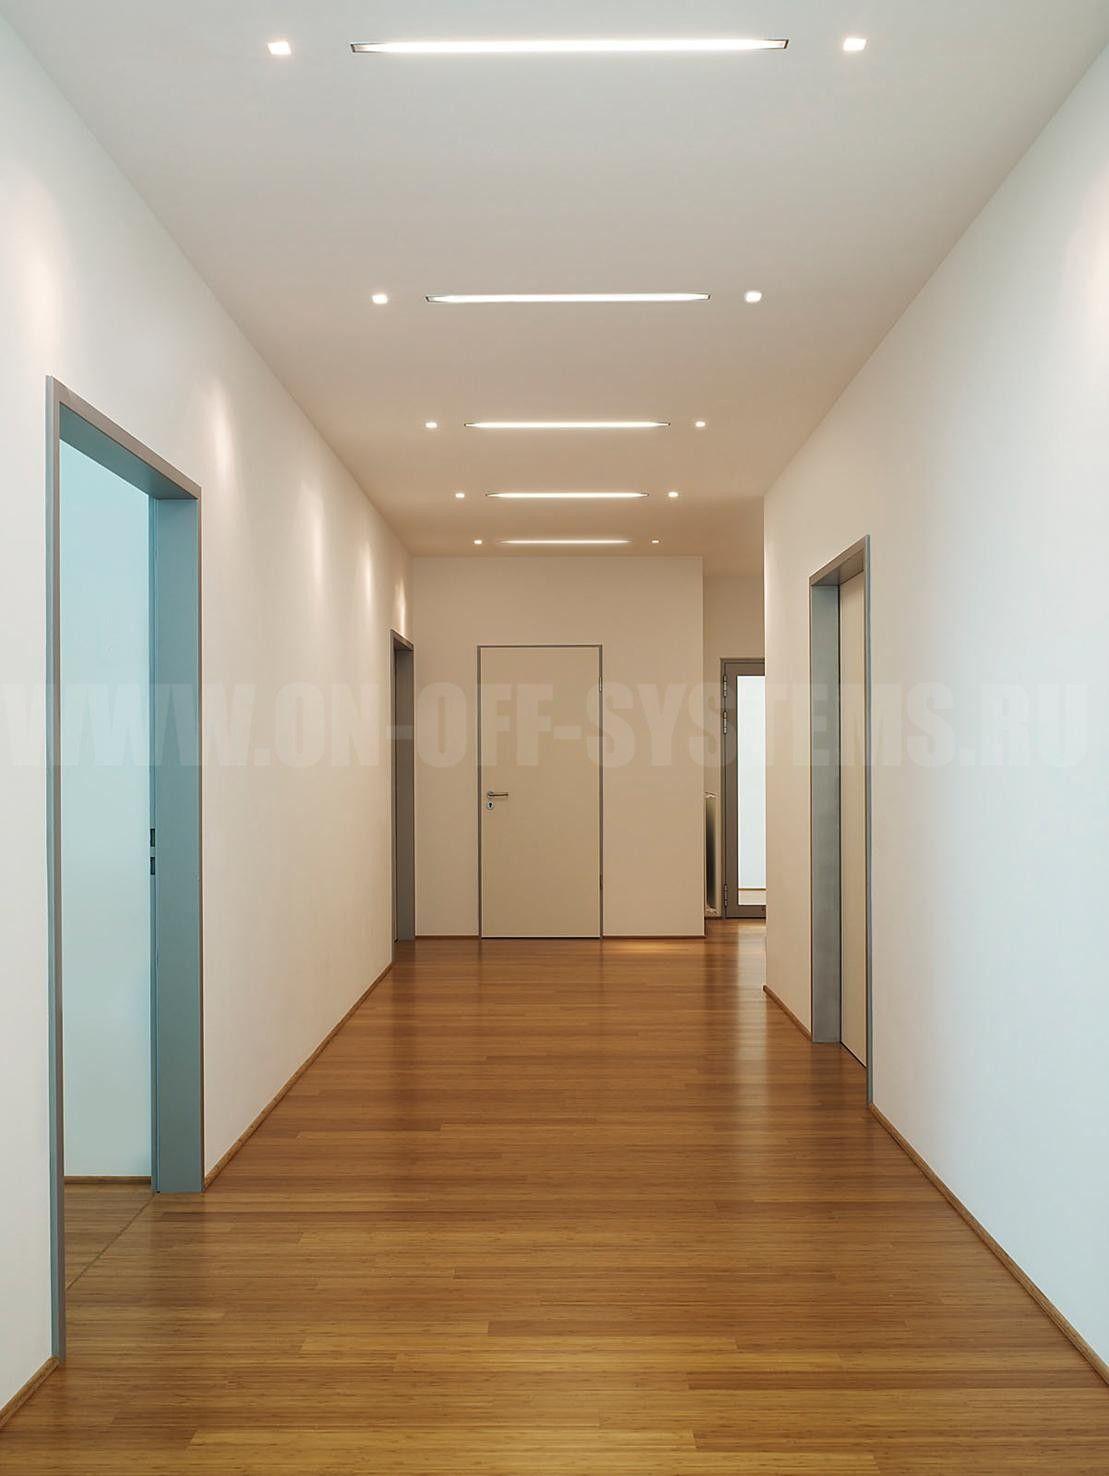 faretti incasso  Casa  Pinterest  Small house floor plans, Lamp light and Smallest house